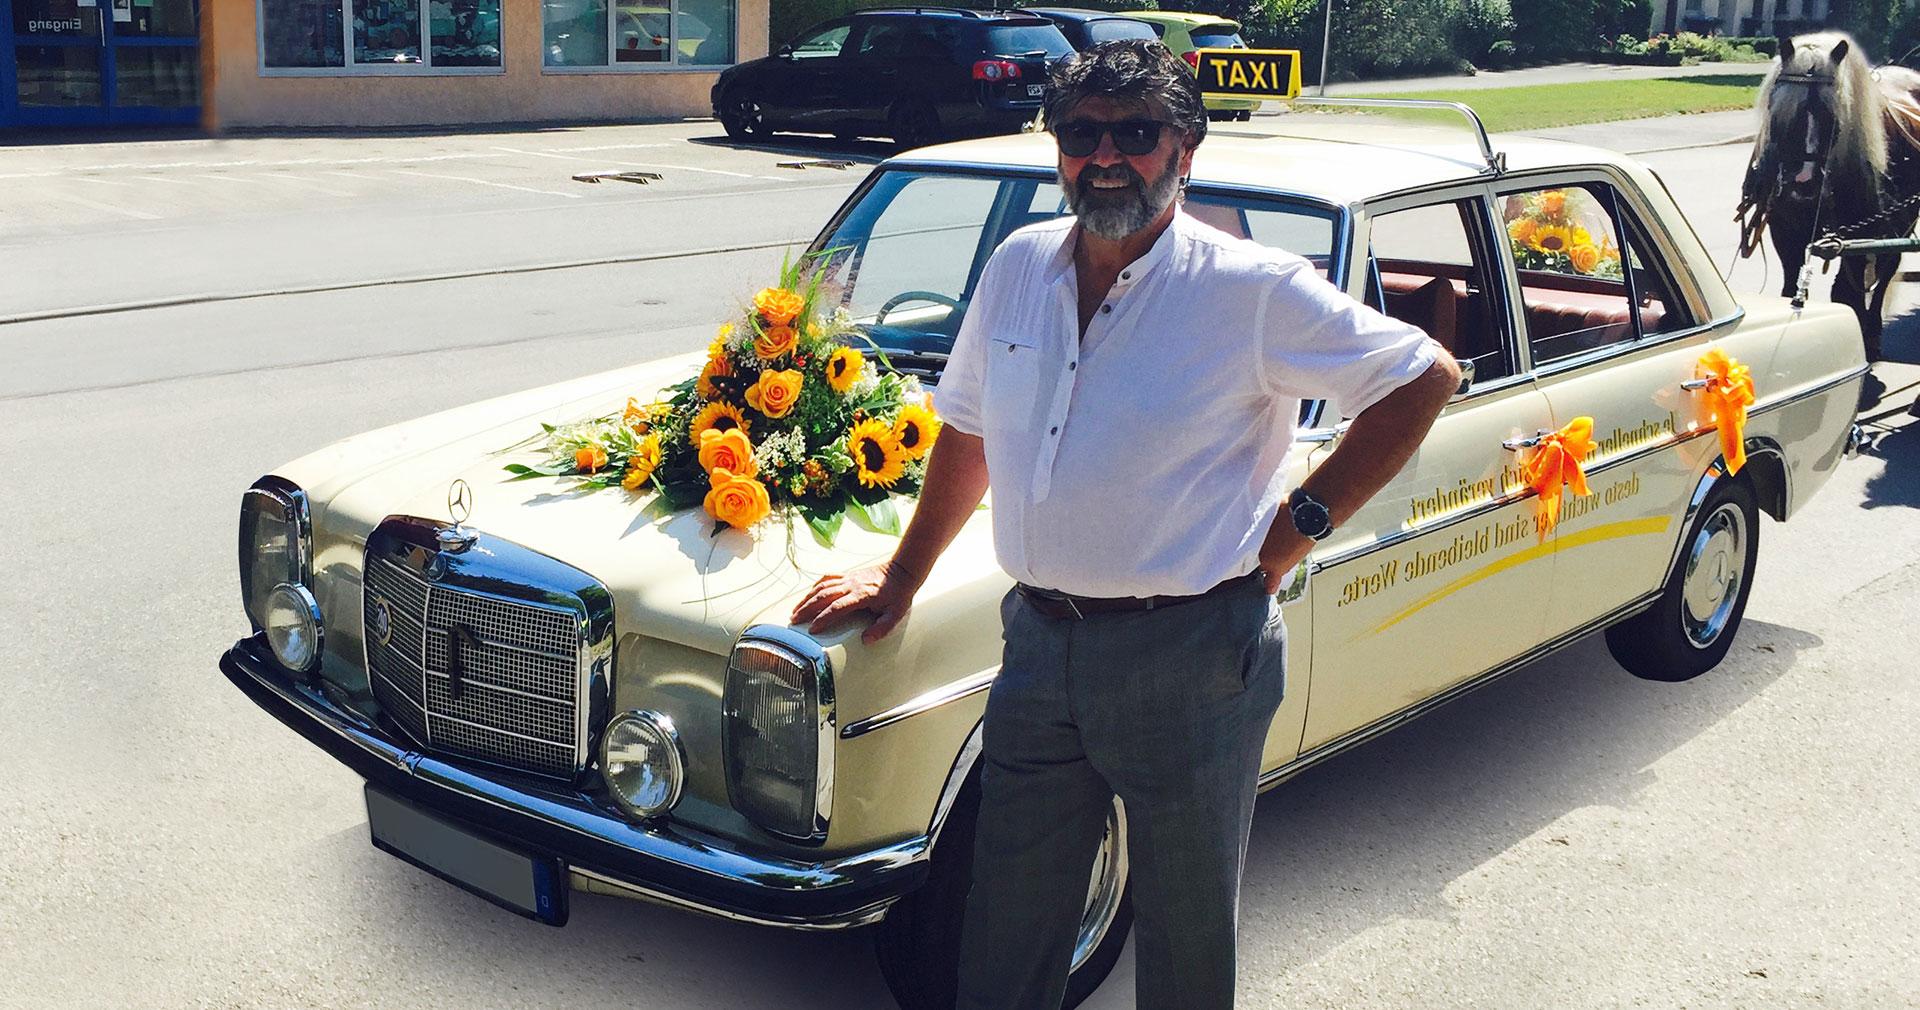 Yunuz Pala Taxiunternehmen